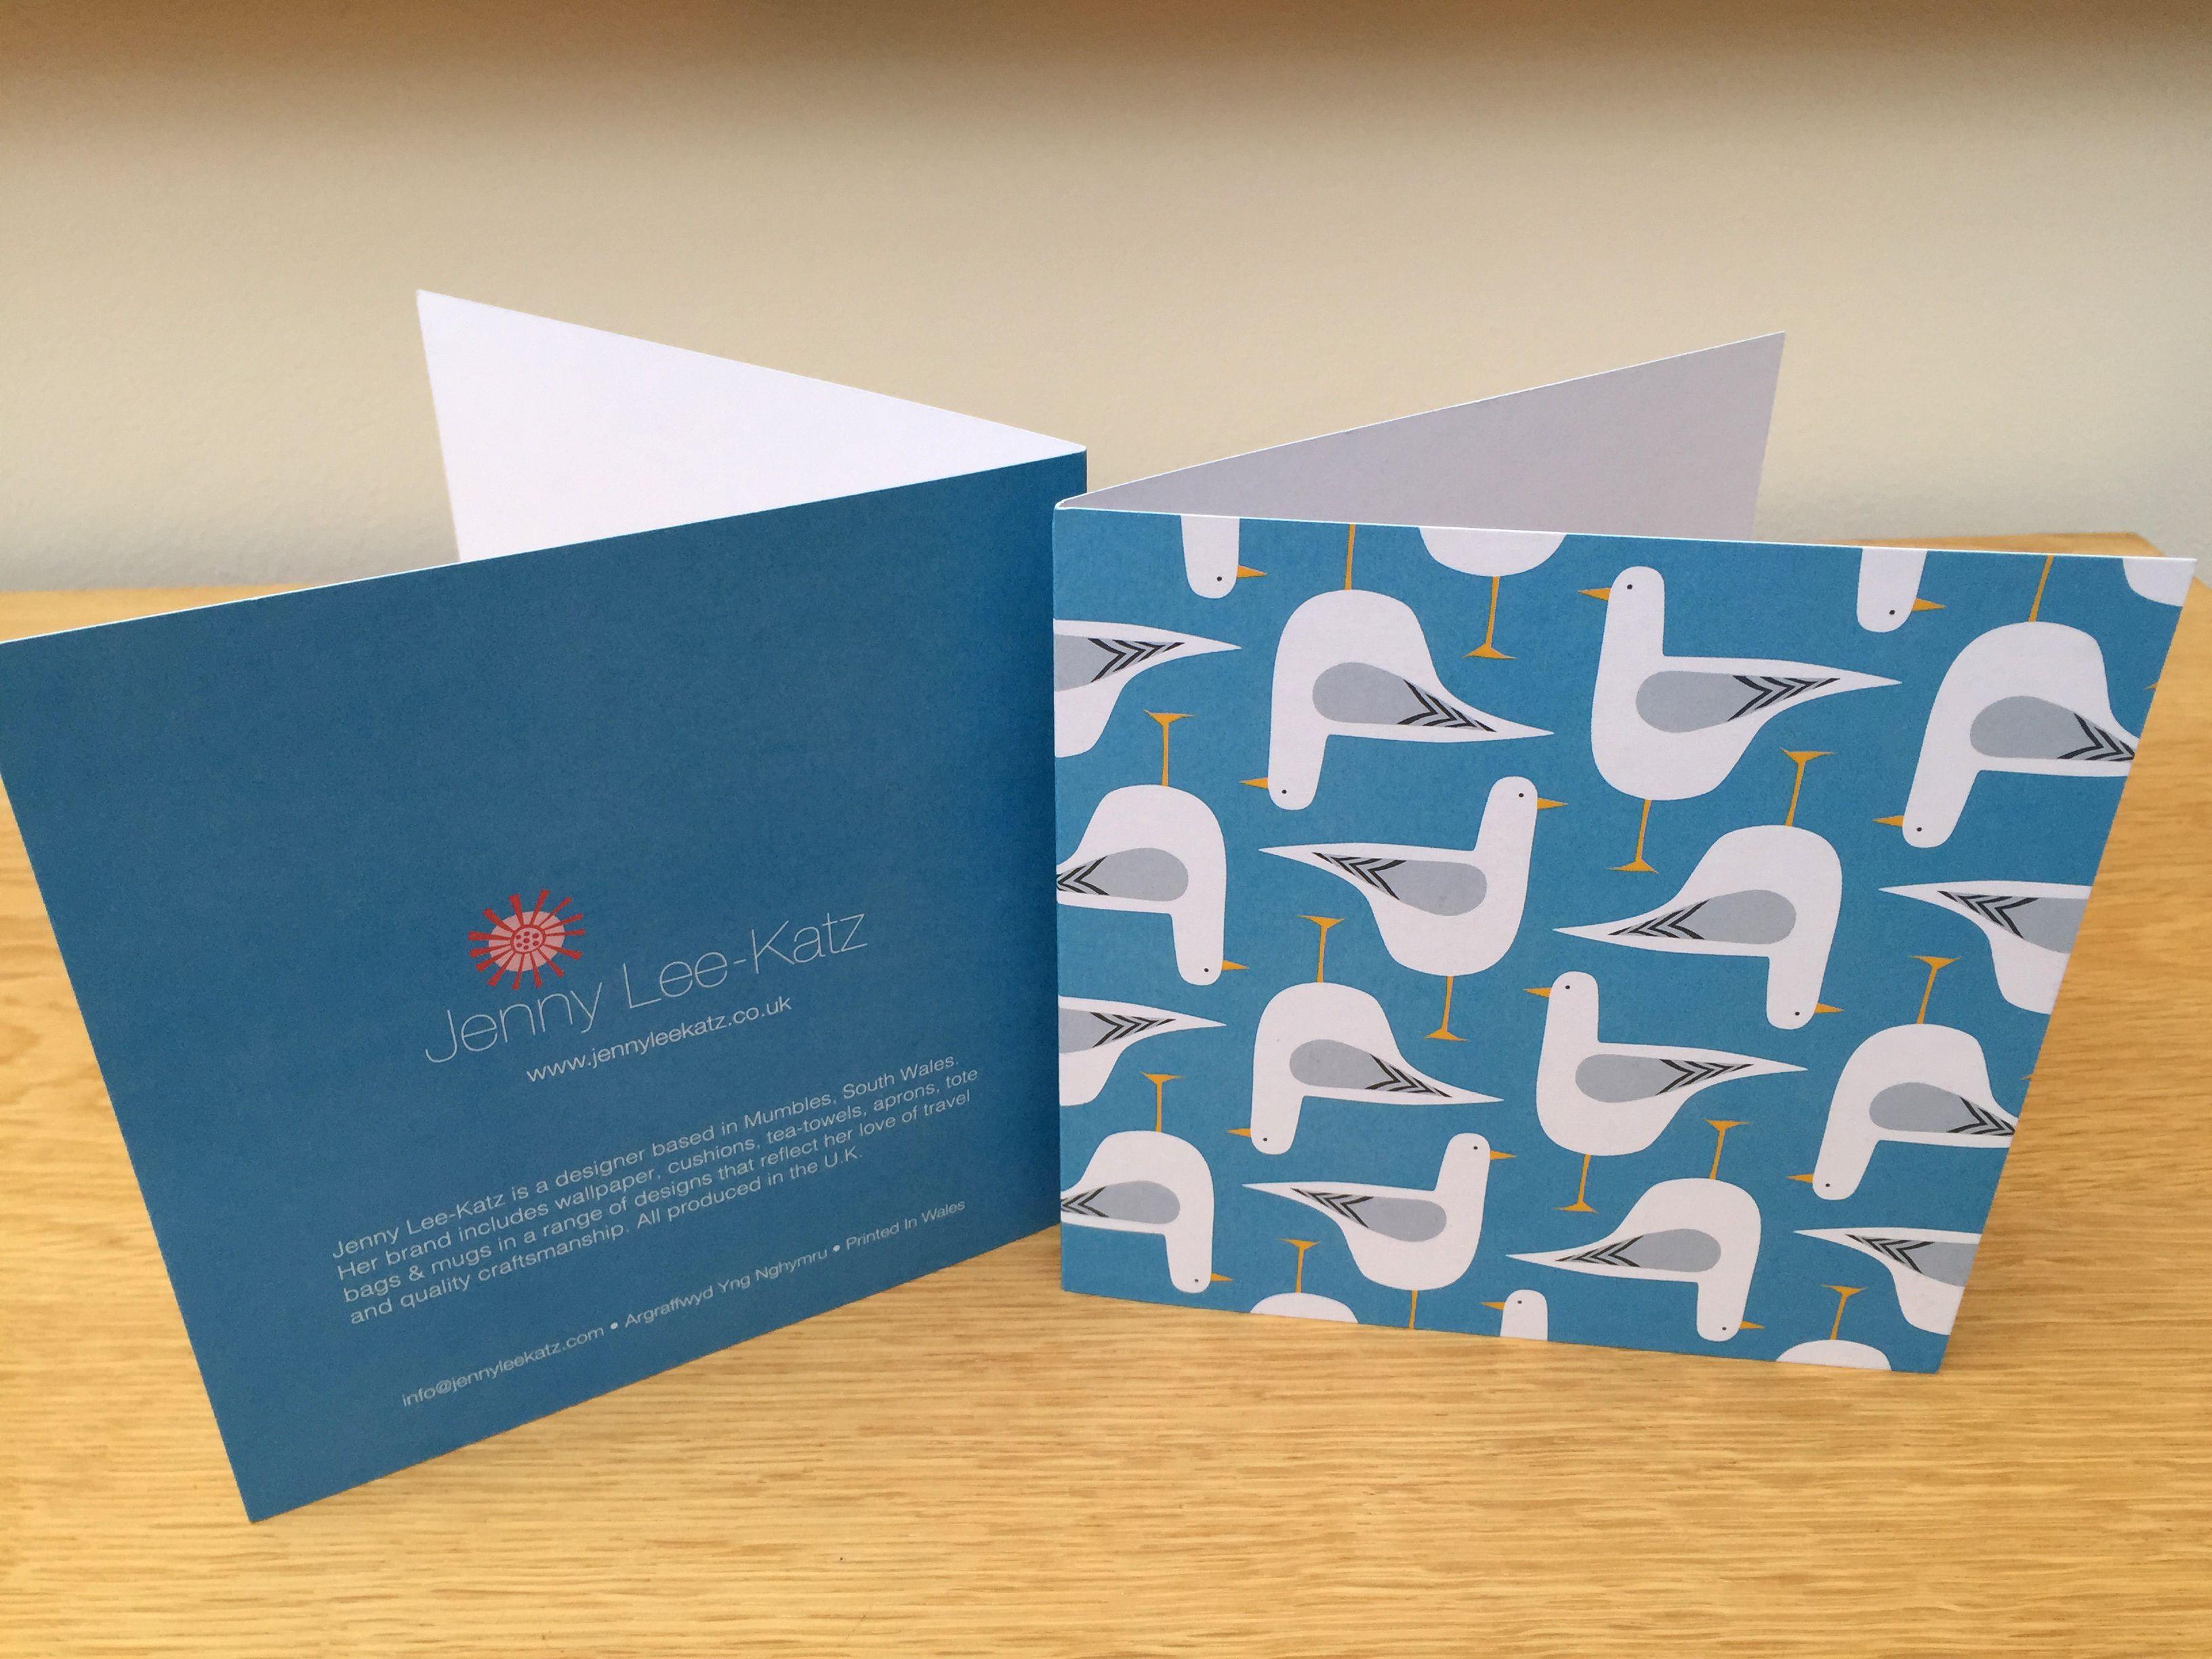 Seagull Design Greeting Card Printed In Wales Seagull Coastal